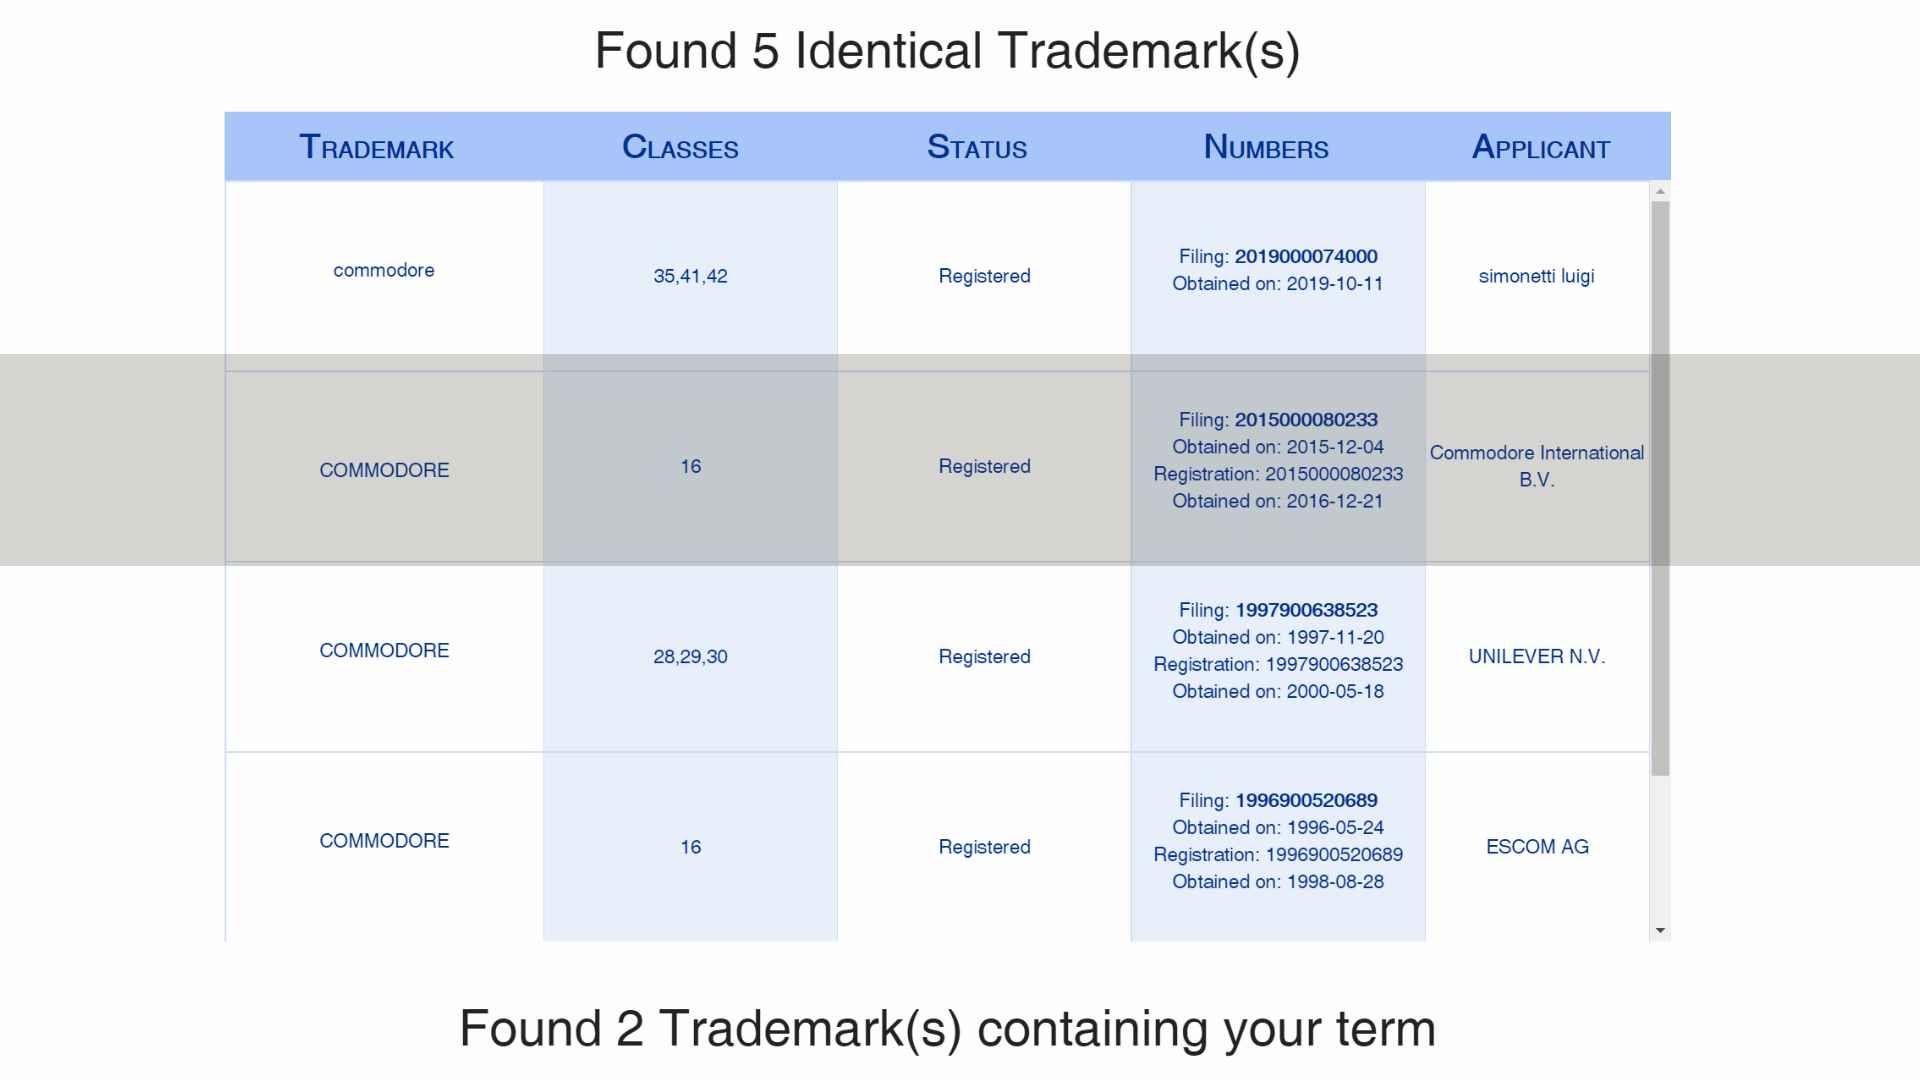 Italian Trademark registrations for Commodore